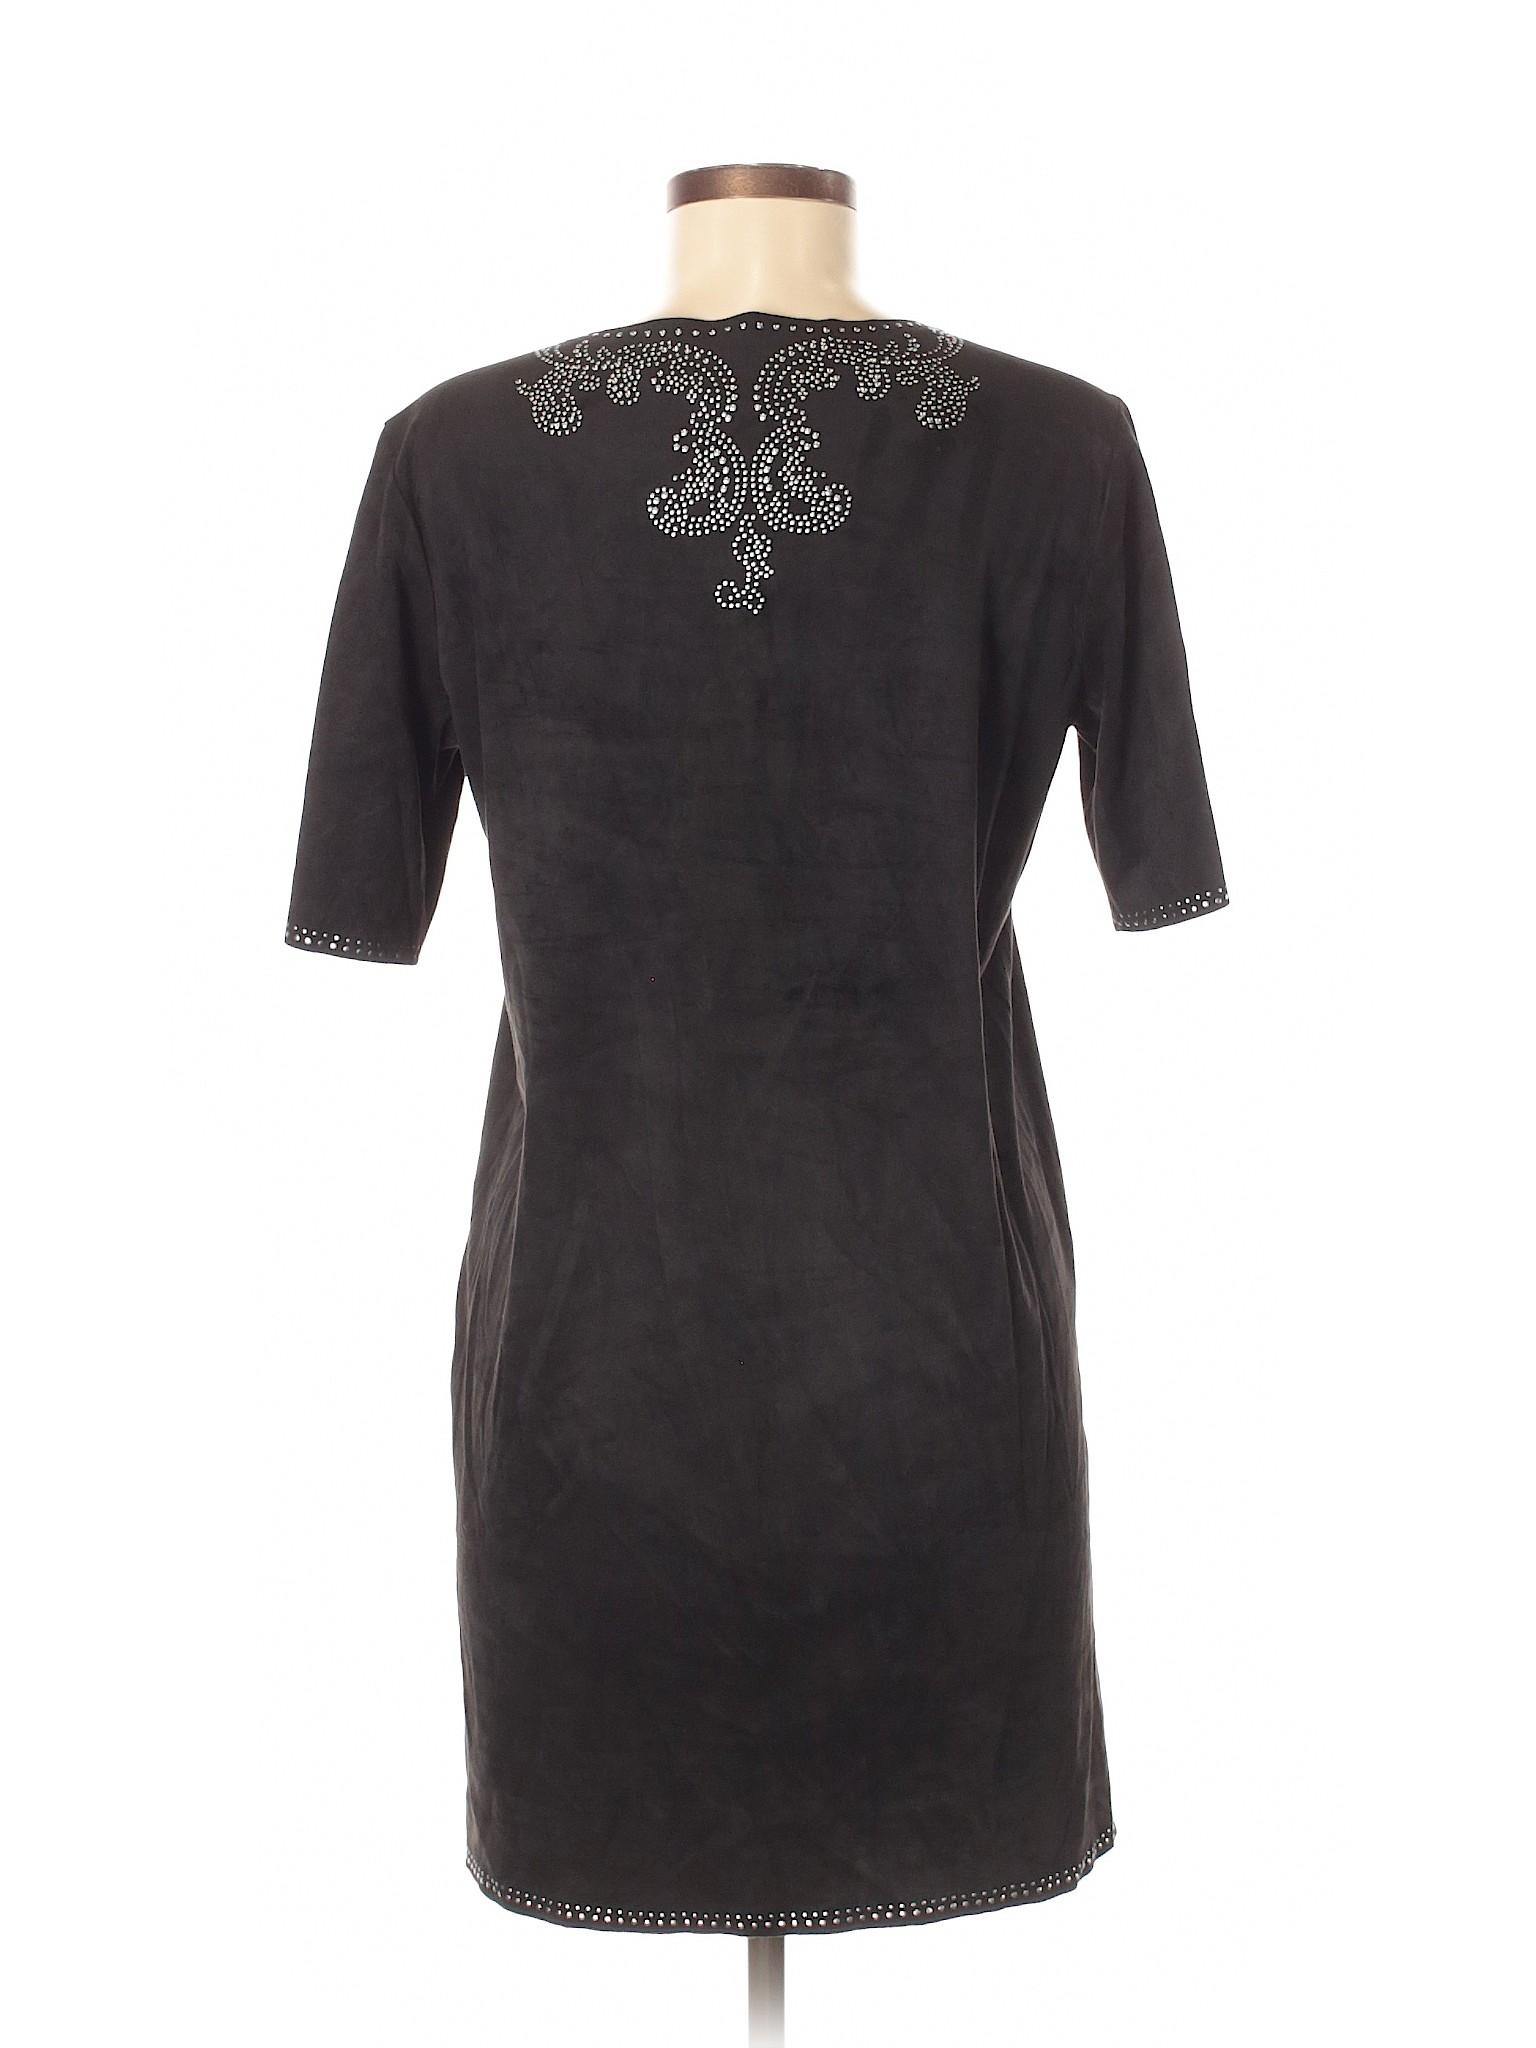 winter Boutique winter Casual Casual Boutique winter Zara Boutique Dress Zara Dress EqxTw50tnA